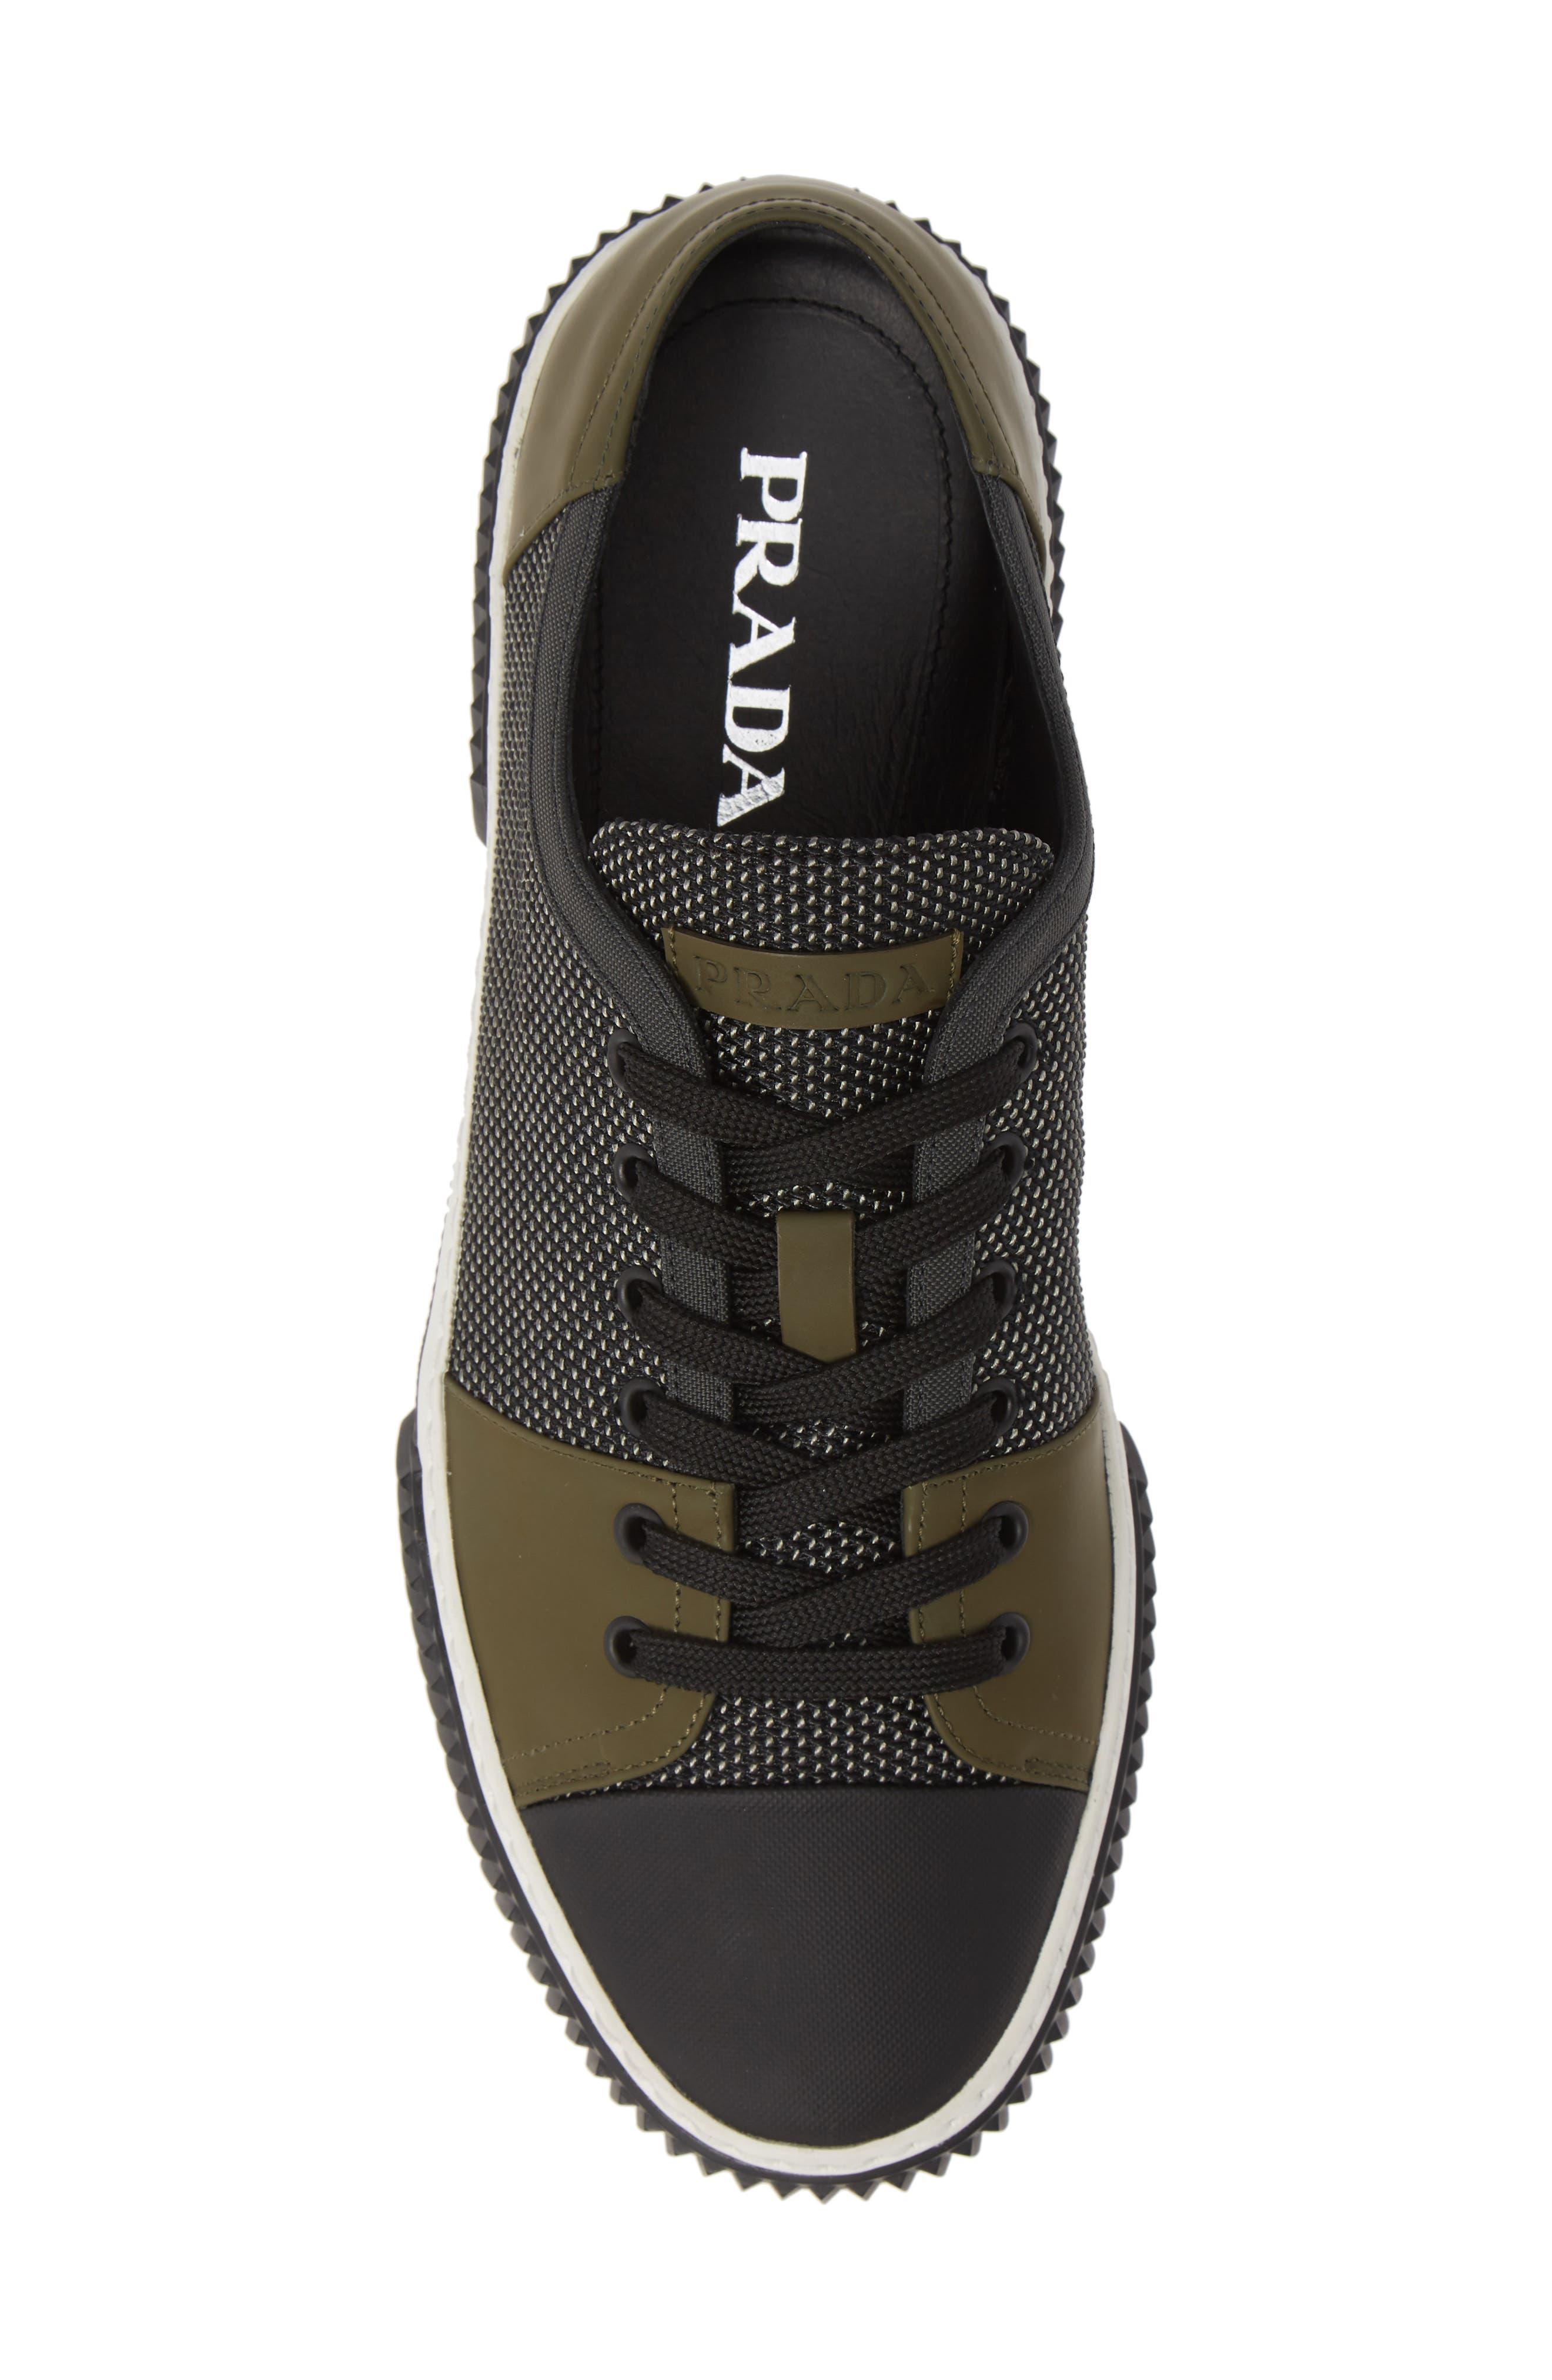 PRADA,                             Linea Rossa Sneaker,                             Alternate thumbnail 5, color,                             GREY/ BLACK